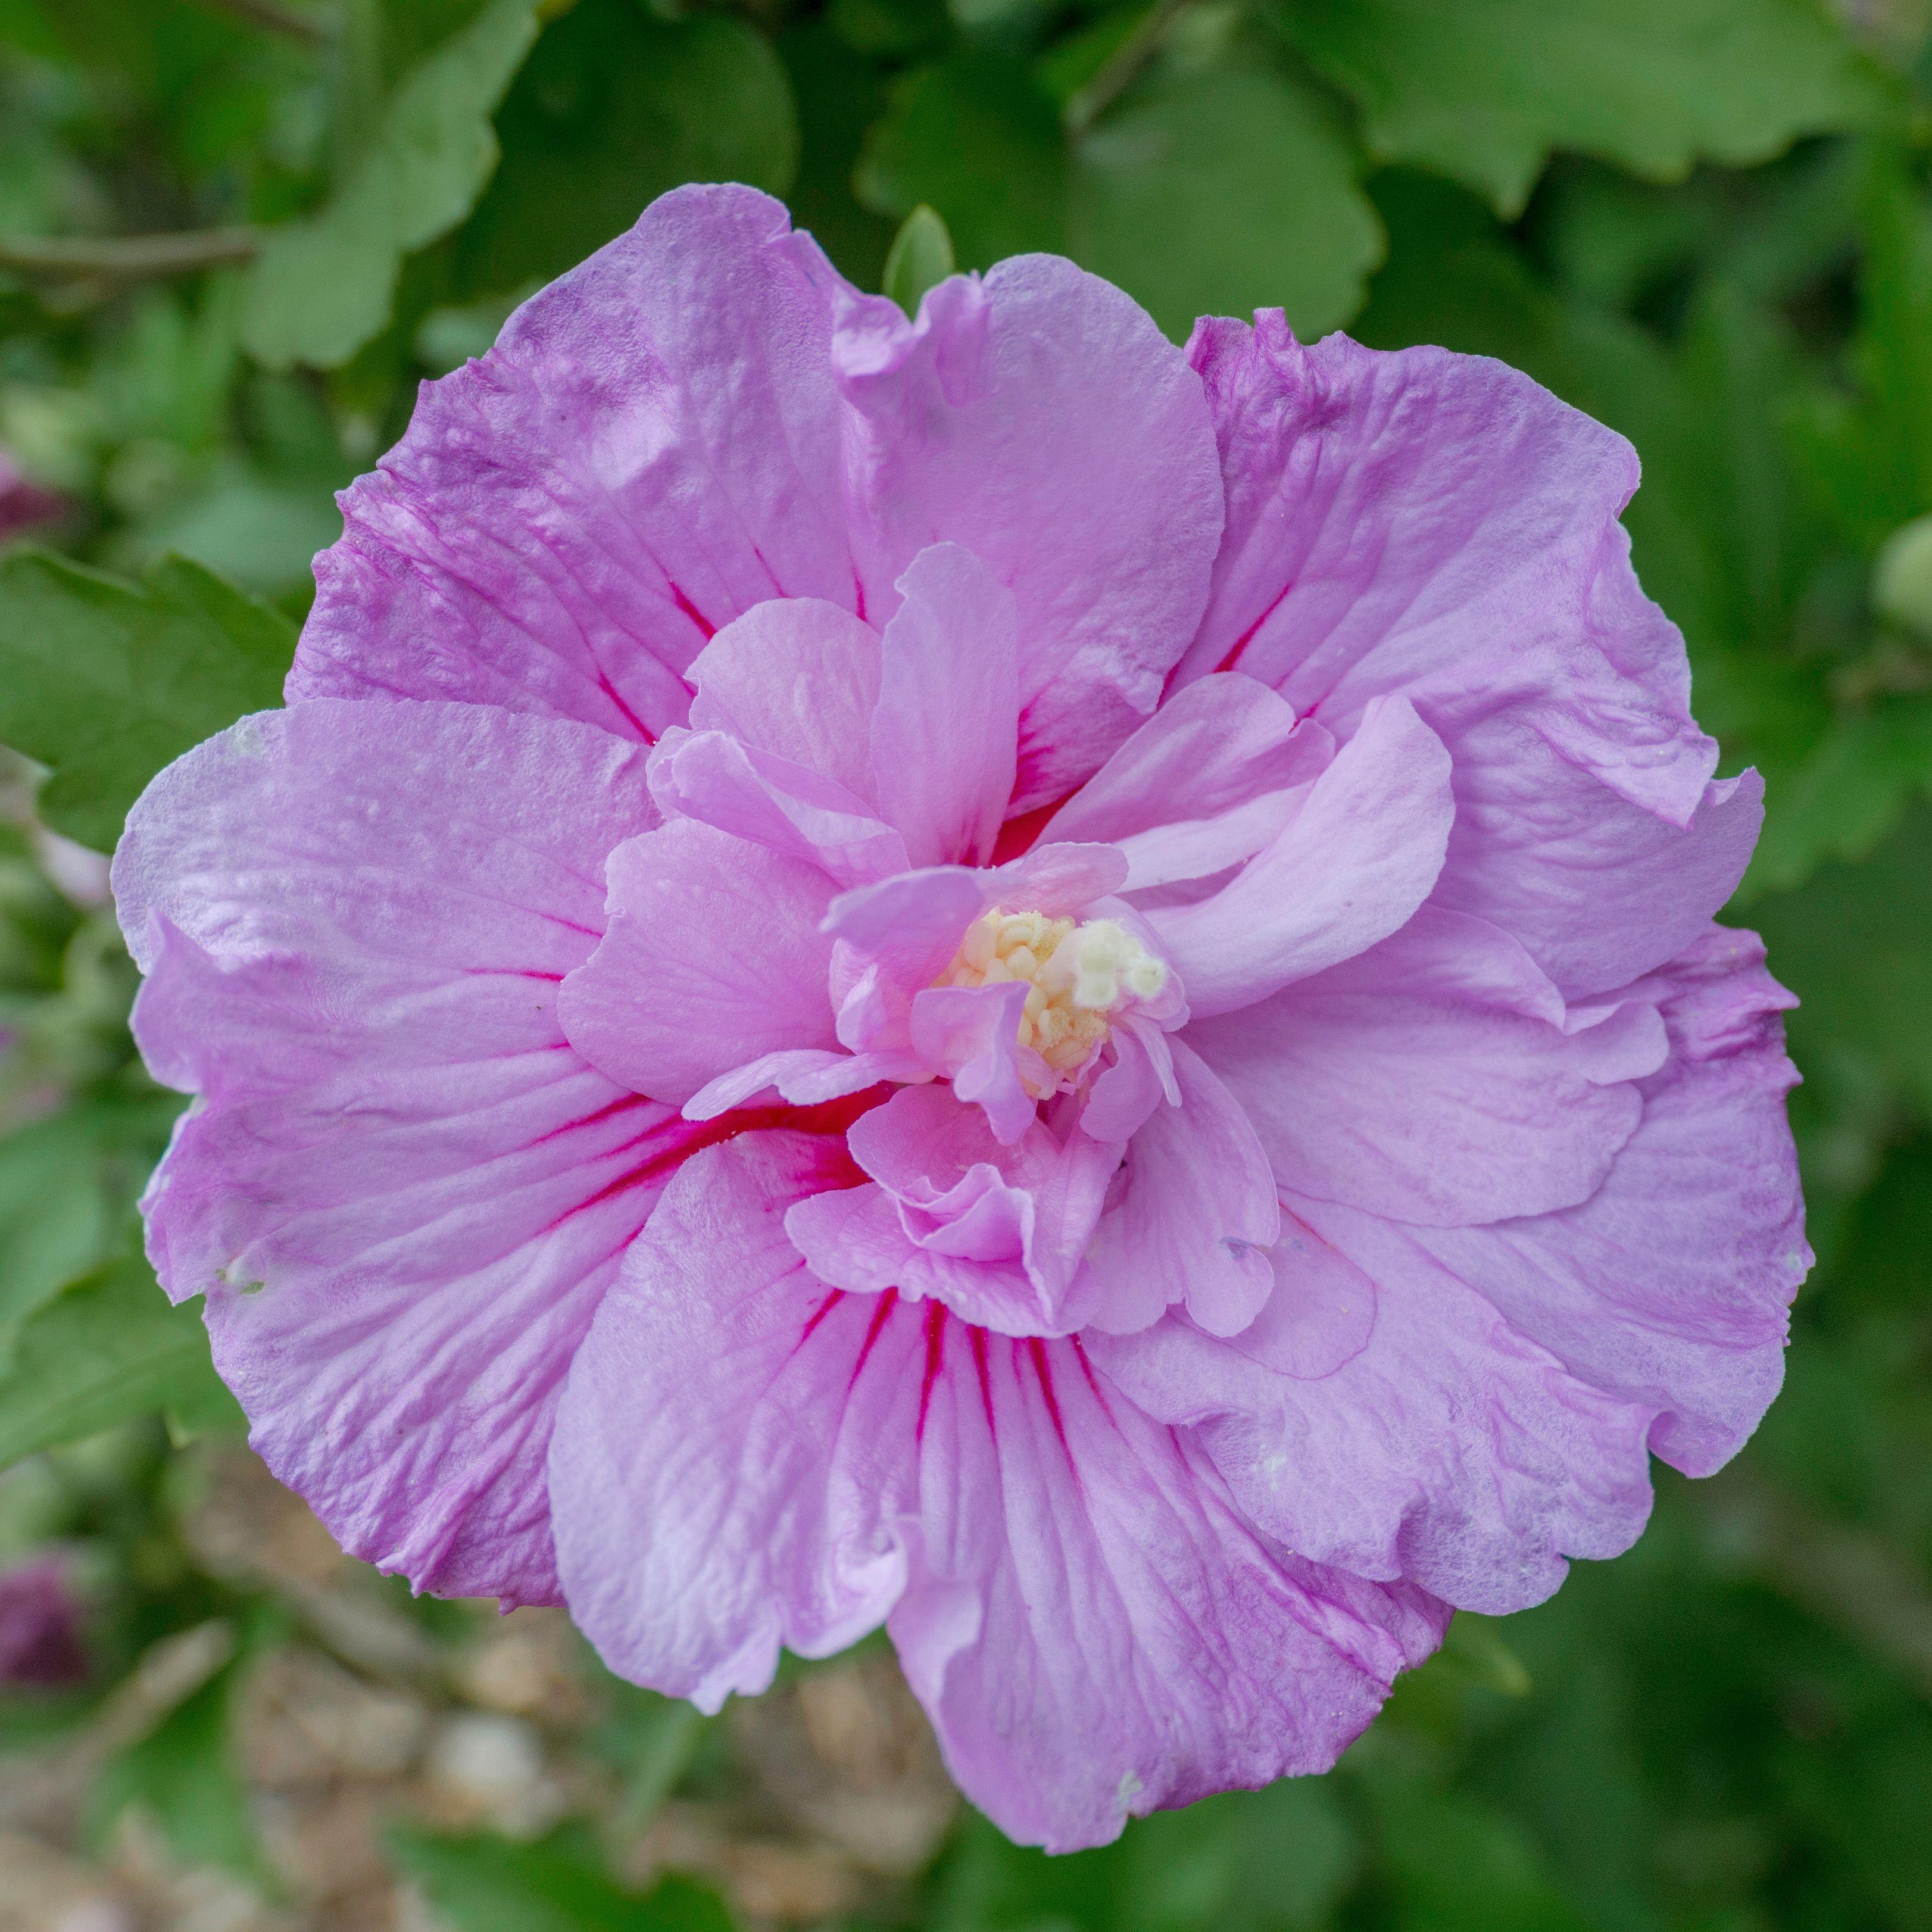 Hibiscus syriacus lavender chiffon rhs hibiscus pinterest hibiscus syriacus lavender chiffon rhs izmirmasajfo